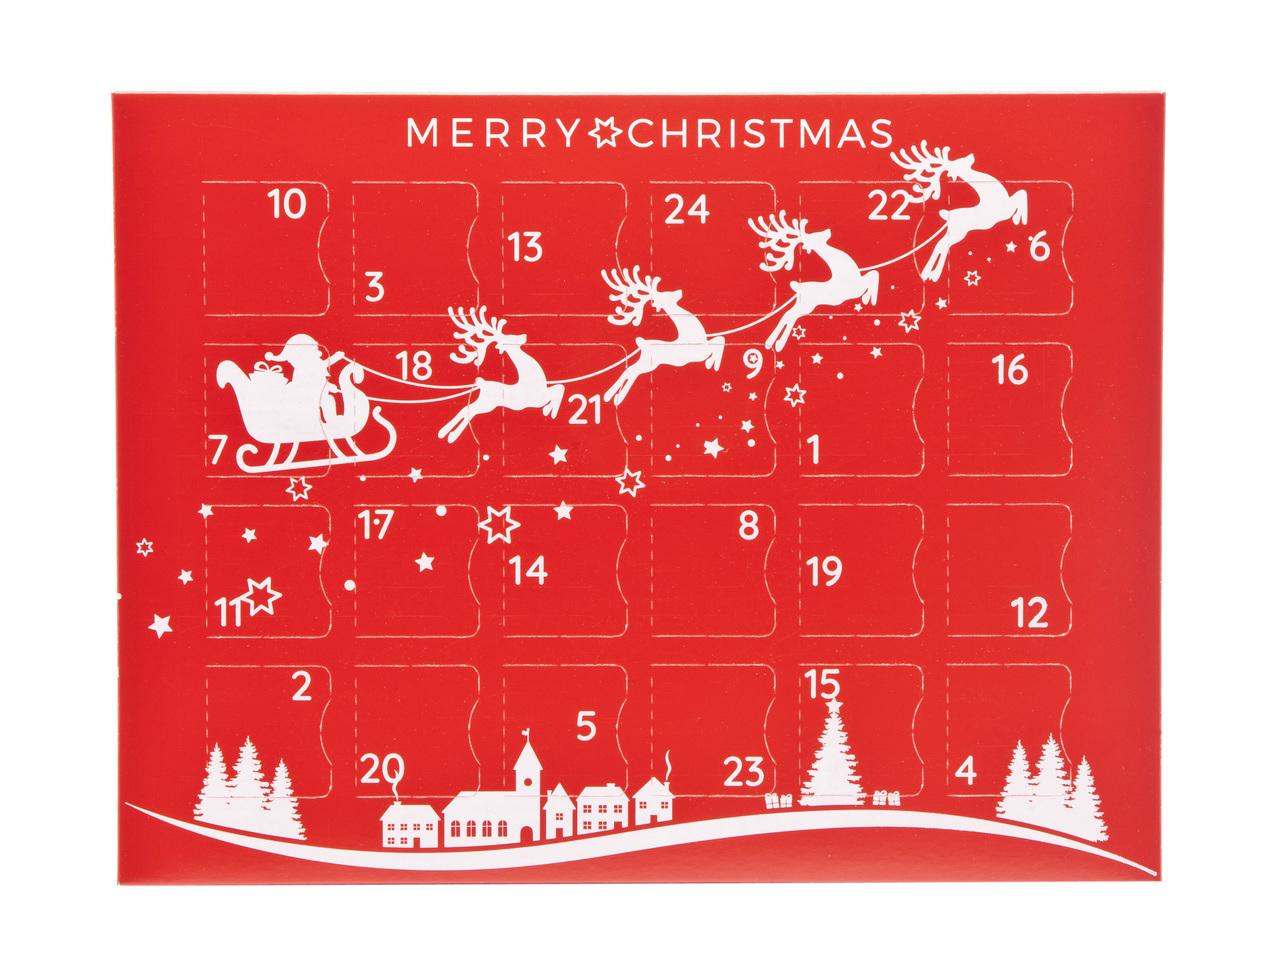 Sleigh Premium Light Advent Calendar sized  - Fill it Yourself Advent Calendar Box Ideal for the festive season